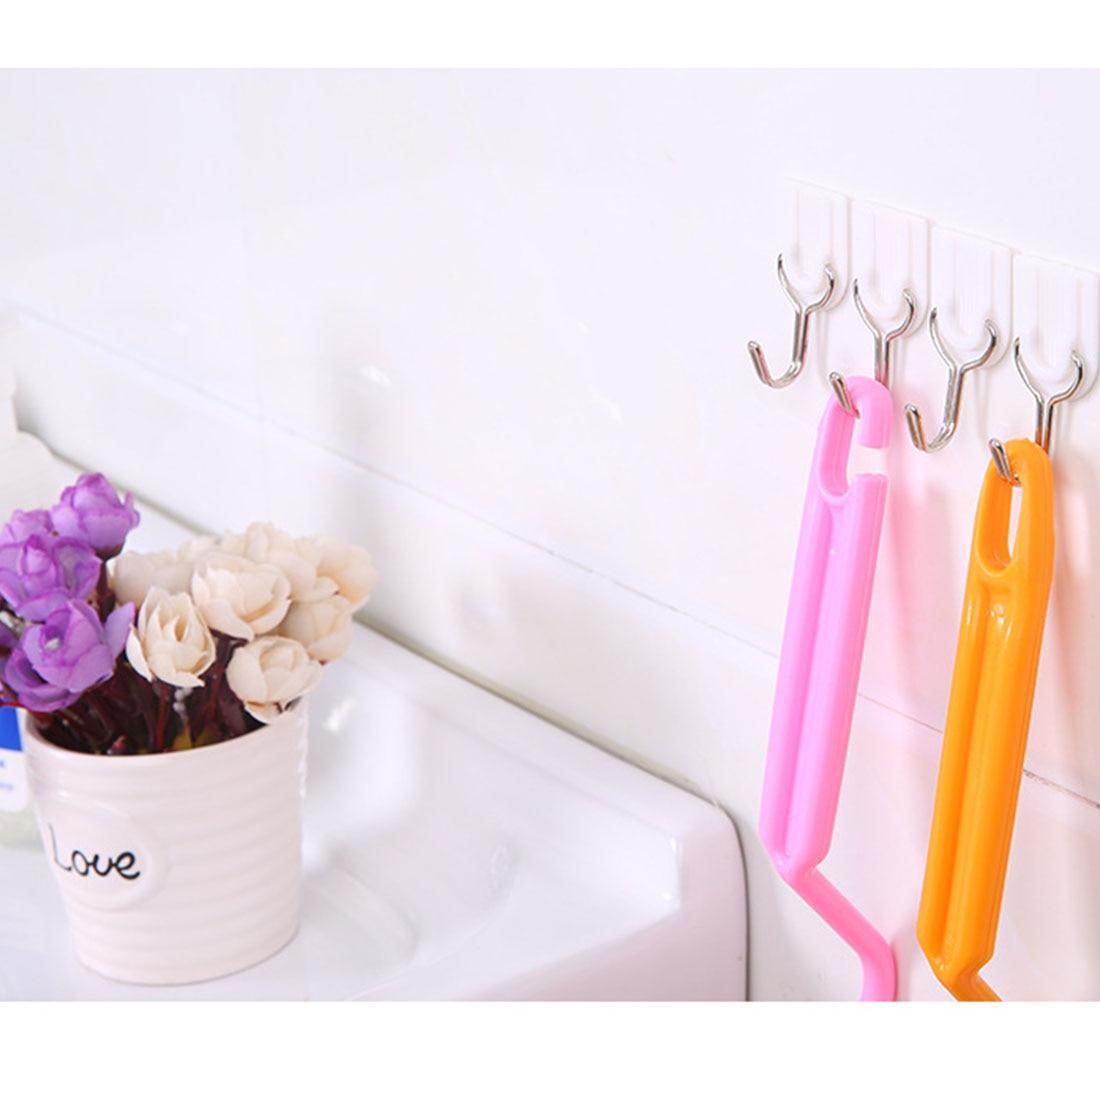 New 6 PCS White Bathroom Door Hooks Family Wall Hanger Hats Bag Key Adhesive Plastic Hook Coat Wall Hooks